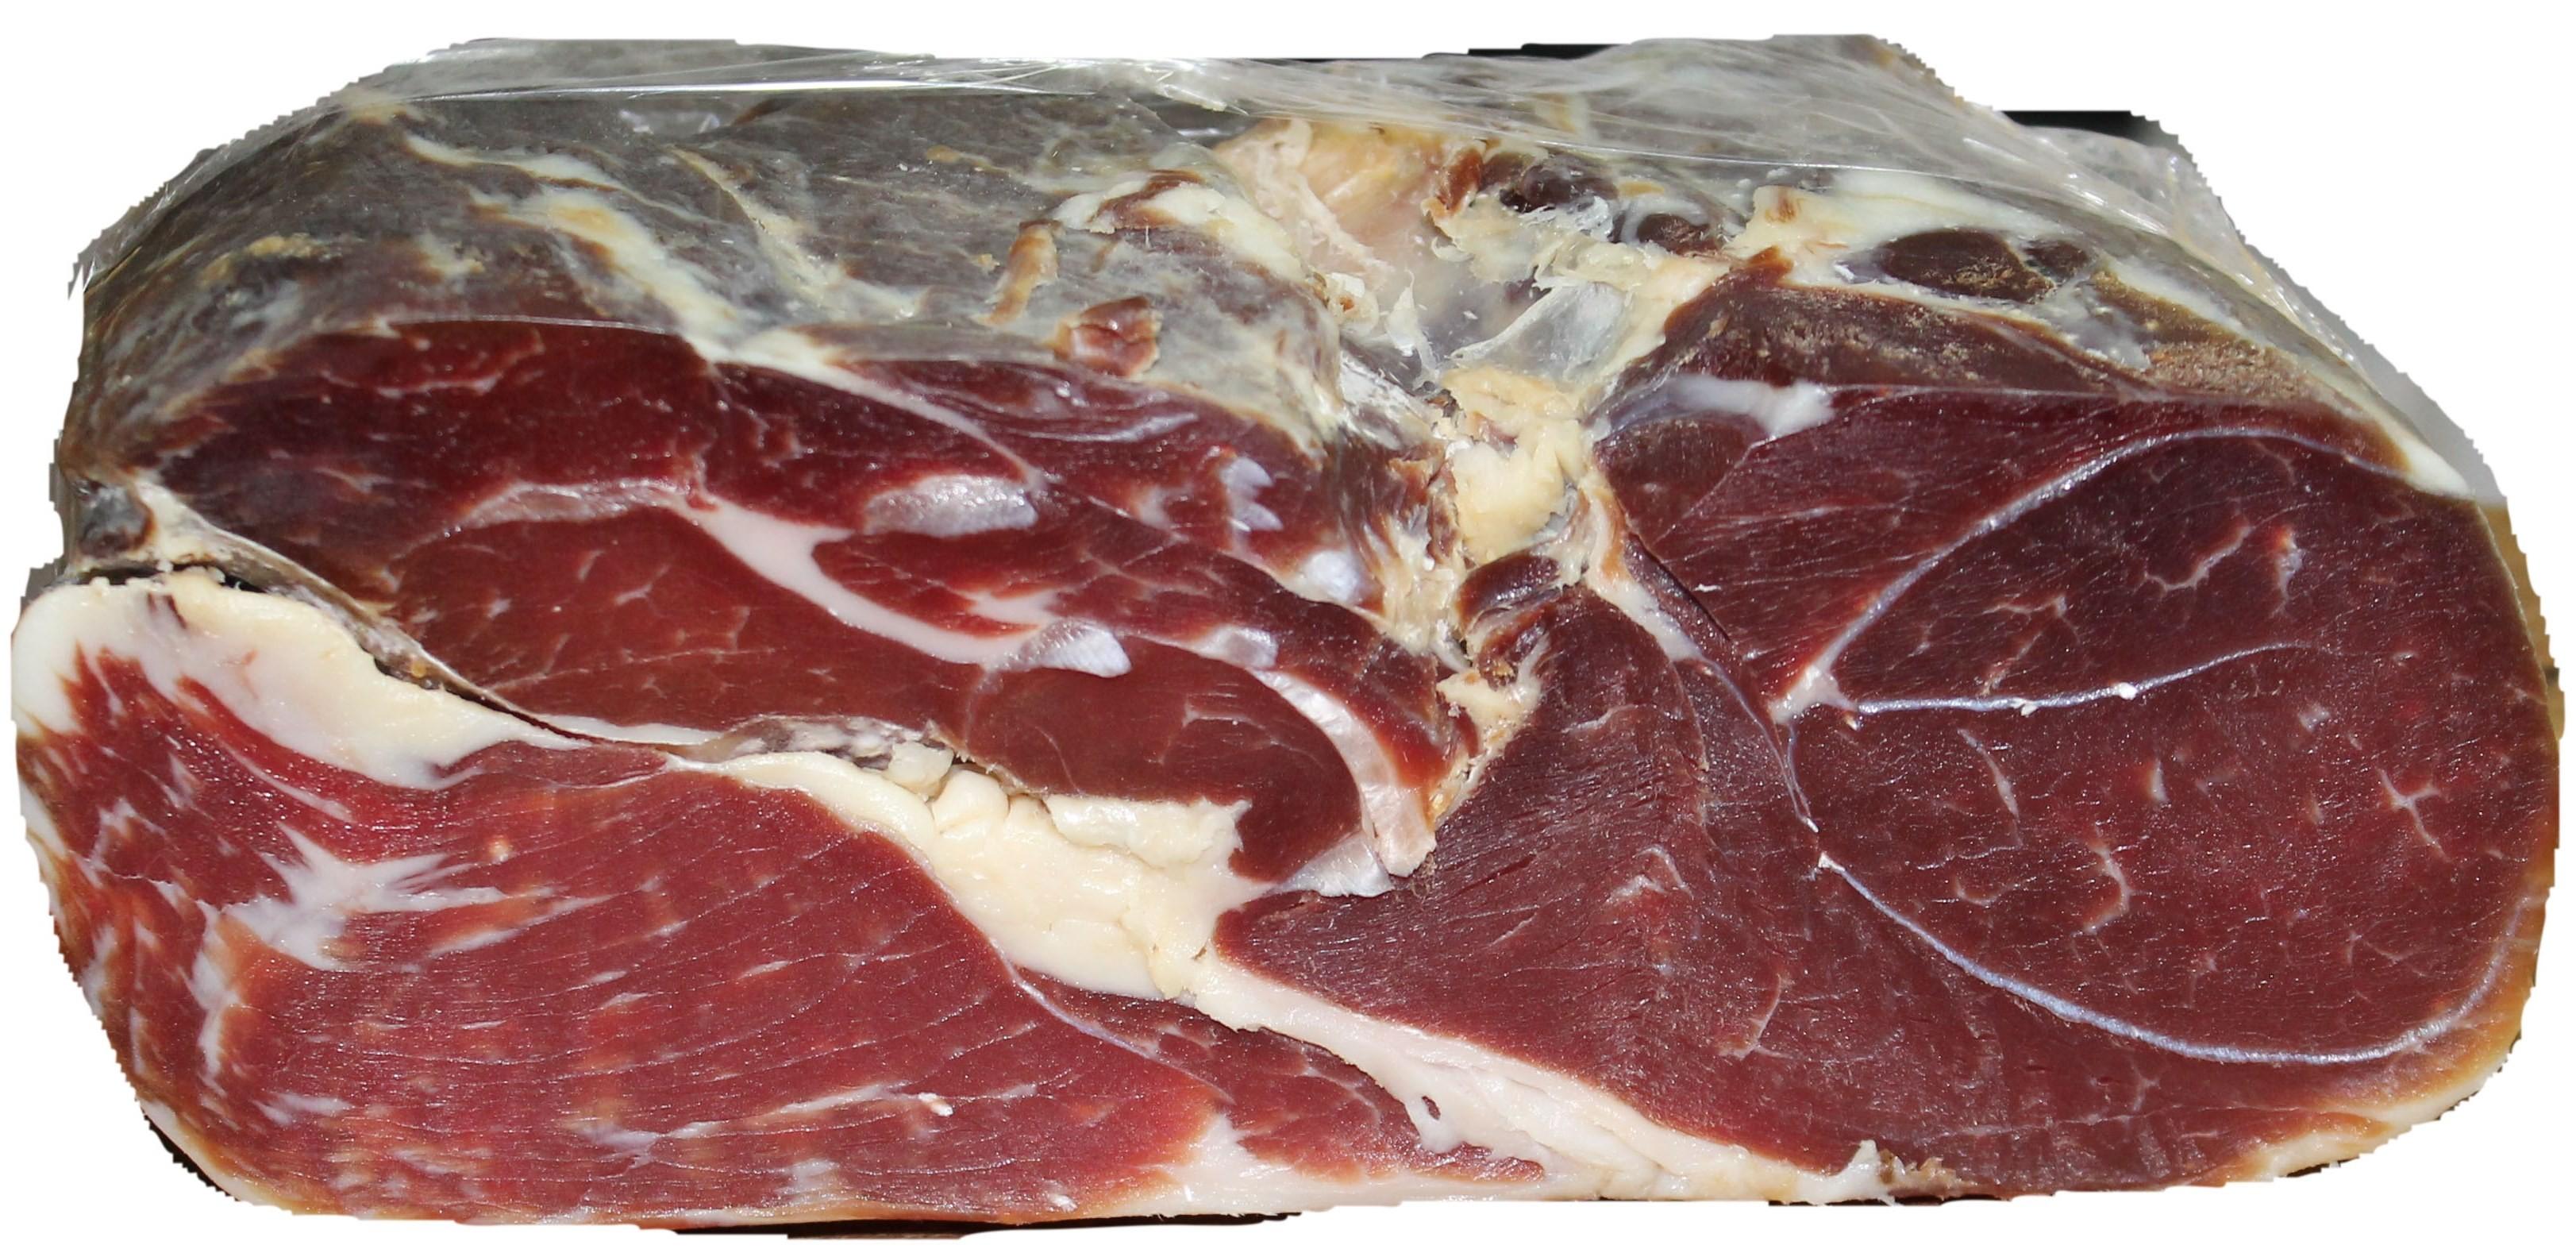 Хамон Iberico Cebo Jamondor 24-28 мес. фото